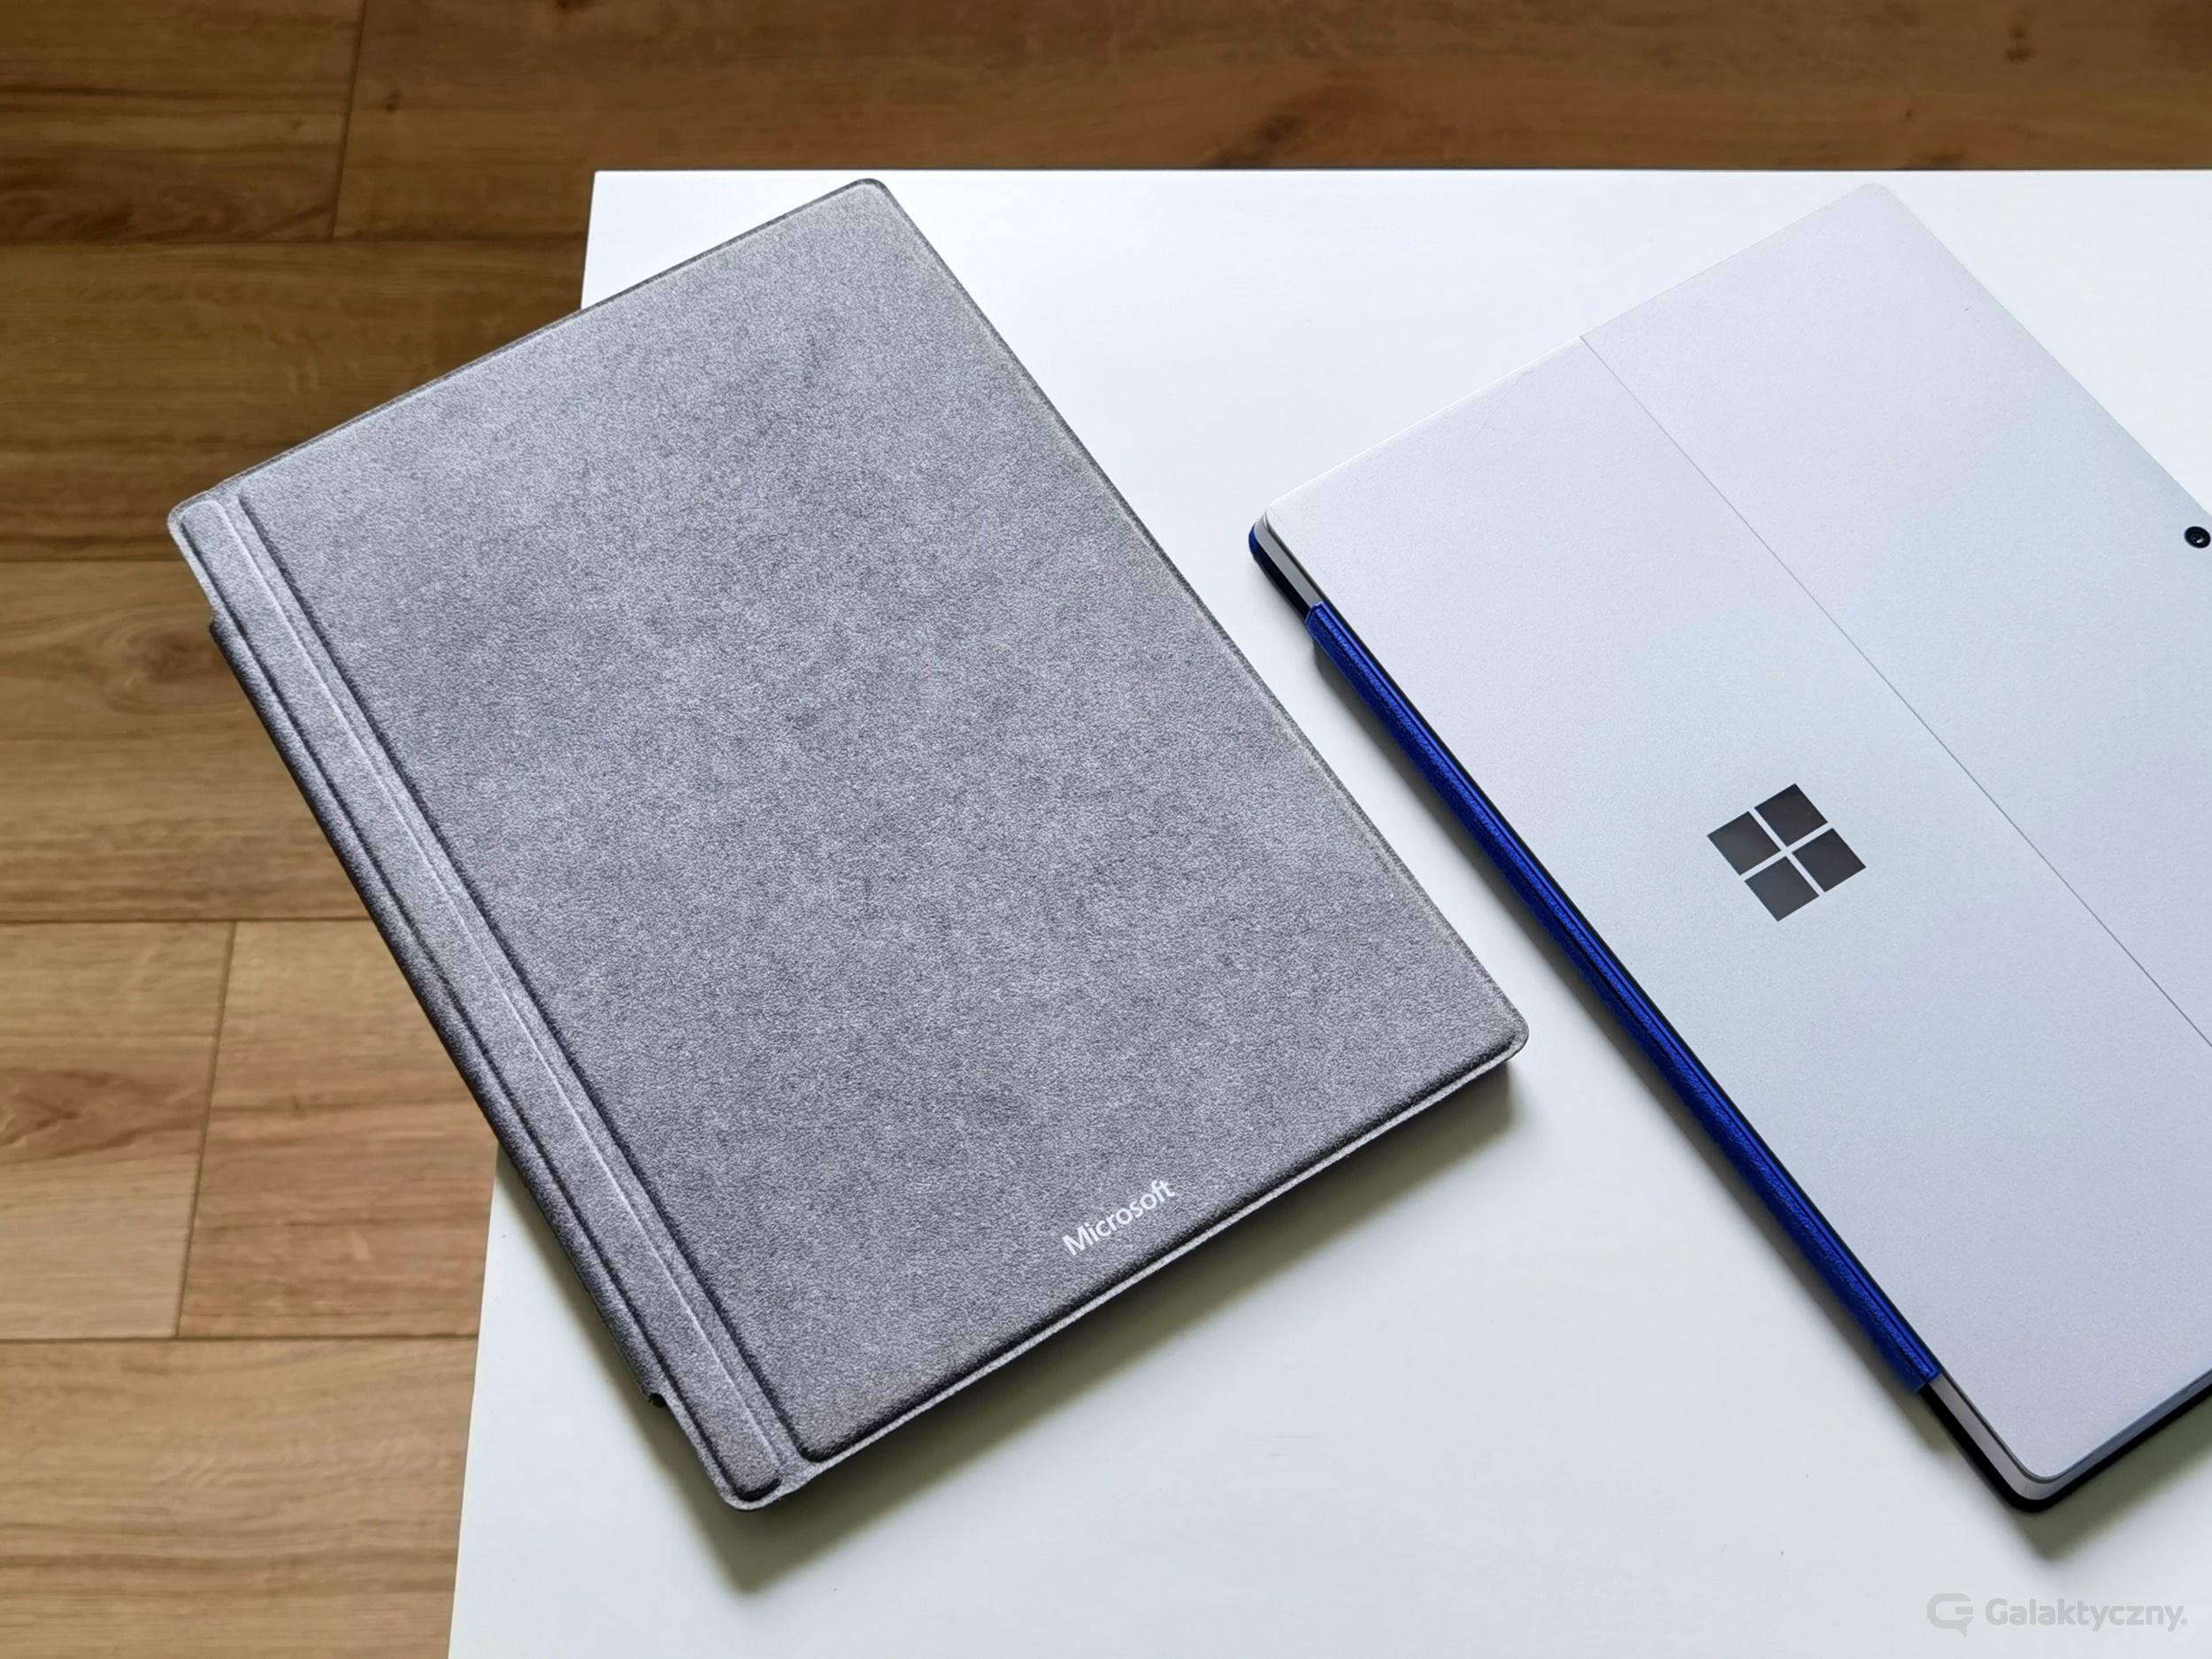 Surface Pro 7 (po lewej), Surface Pro 4 (po prawej)